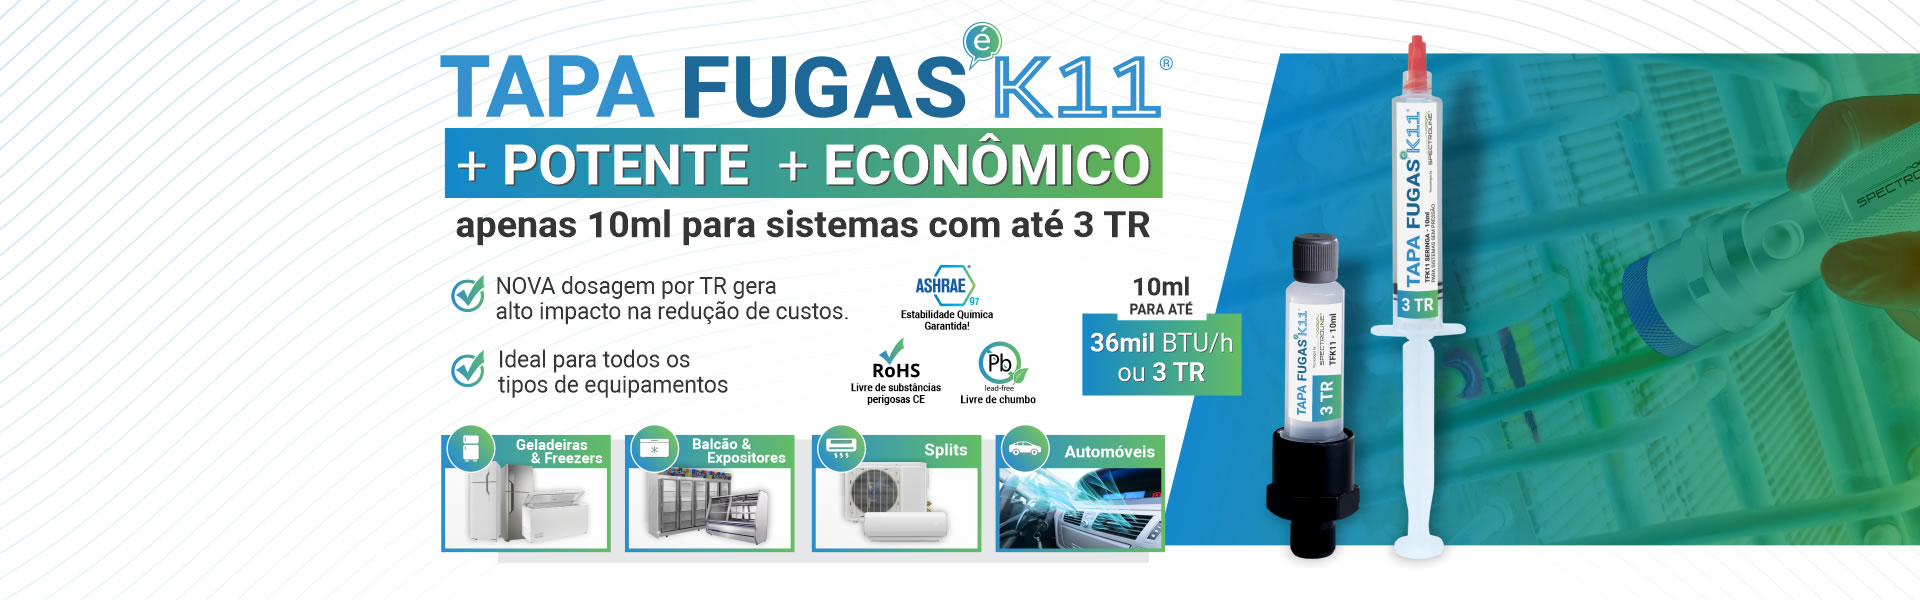 TAPA FUGAS K11®